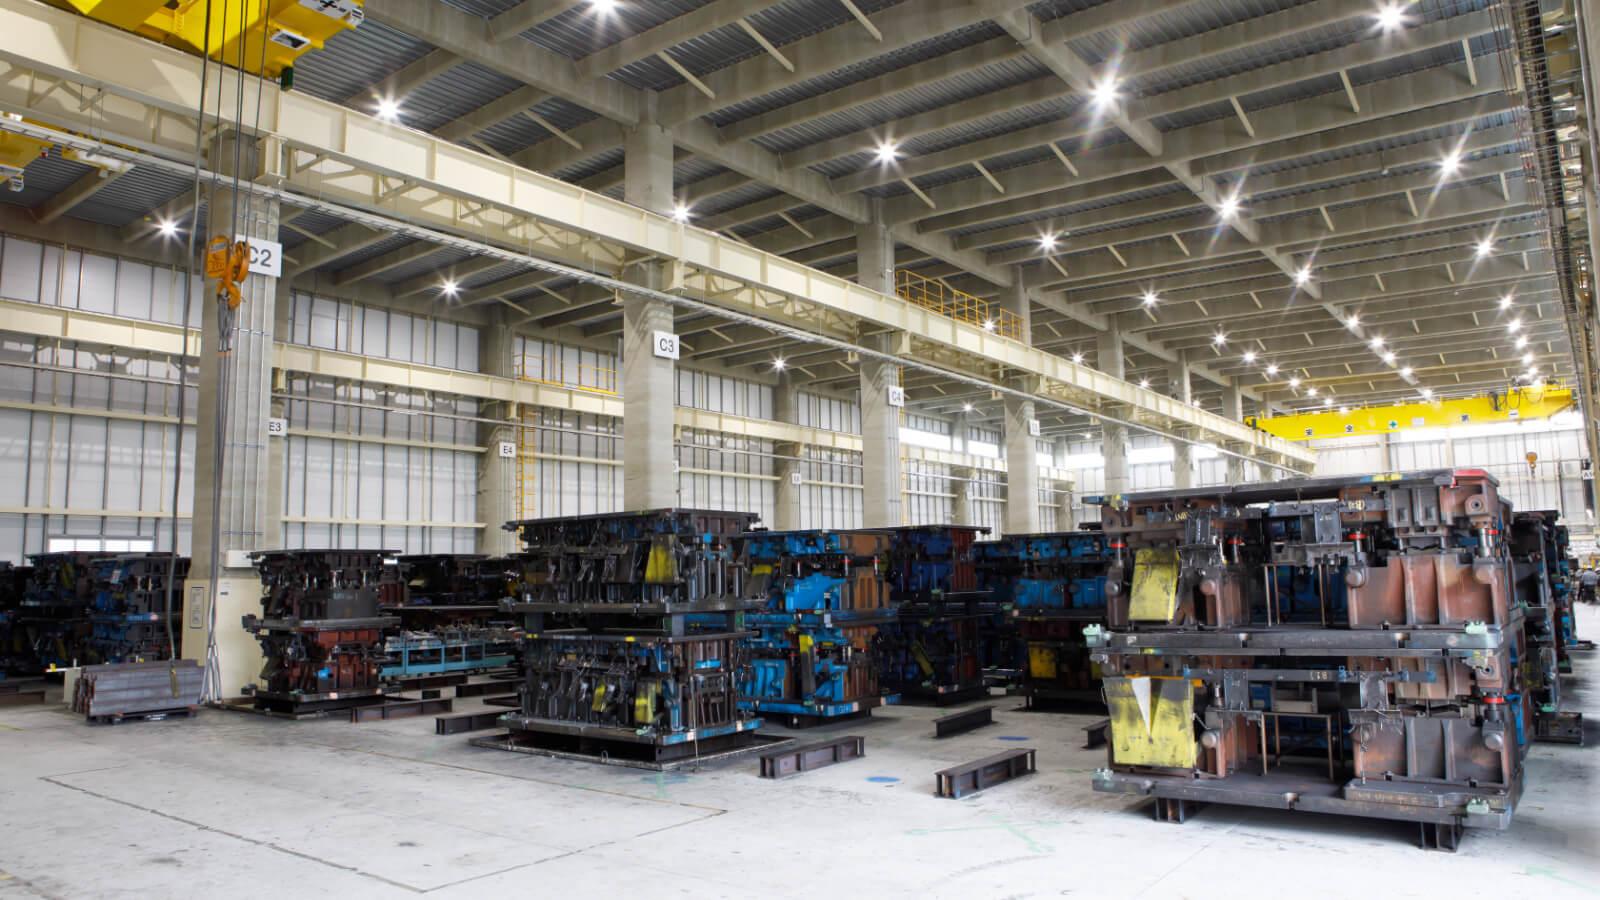 額田工場の金型倉庫